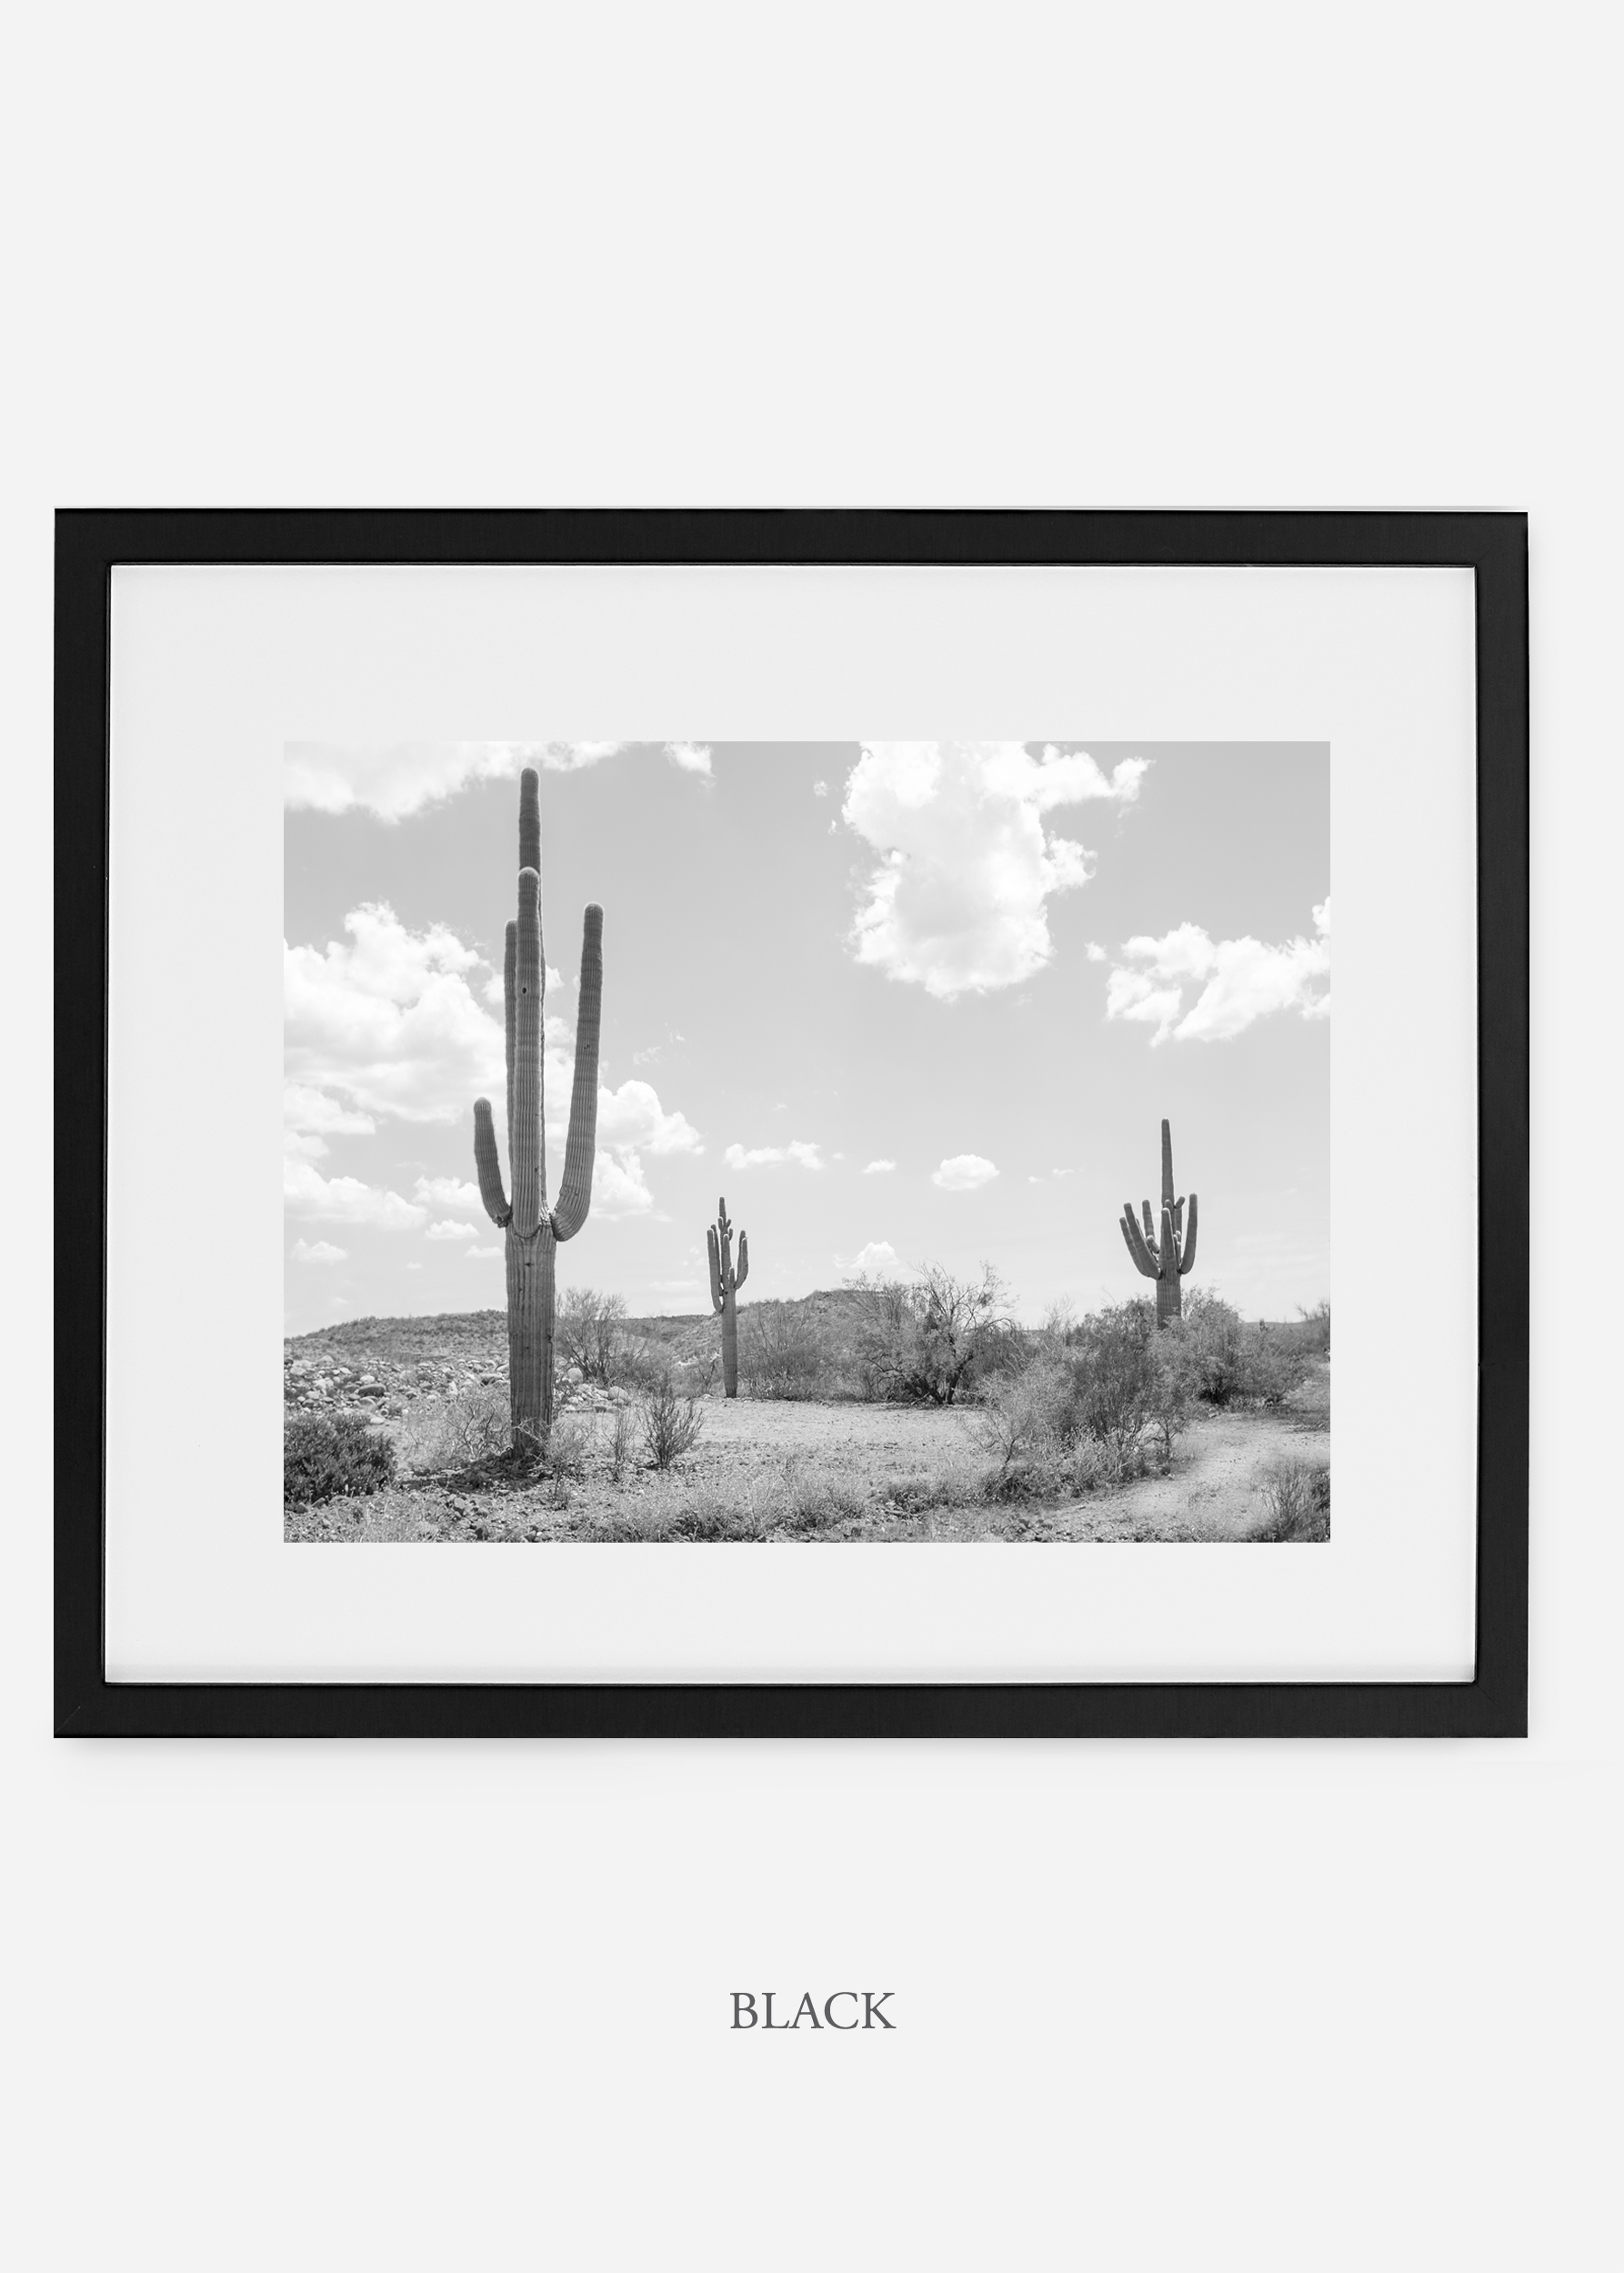 wildercalifornia_blackframe_threesaguaro_cactus_art_interiordesign.jpg